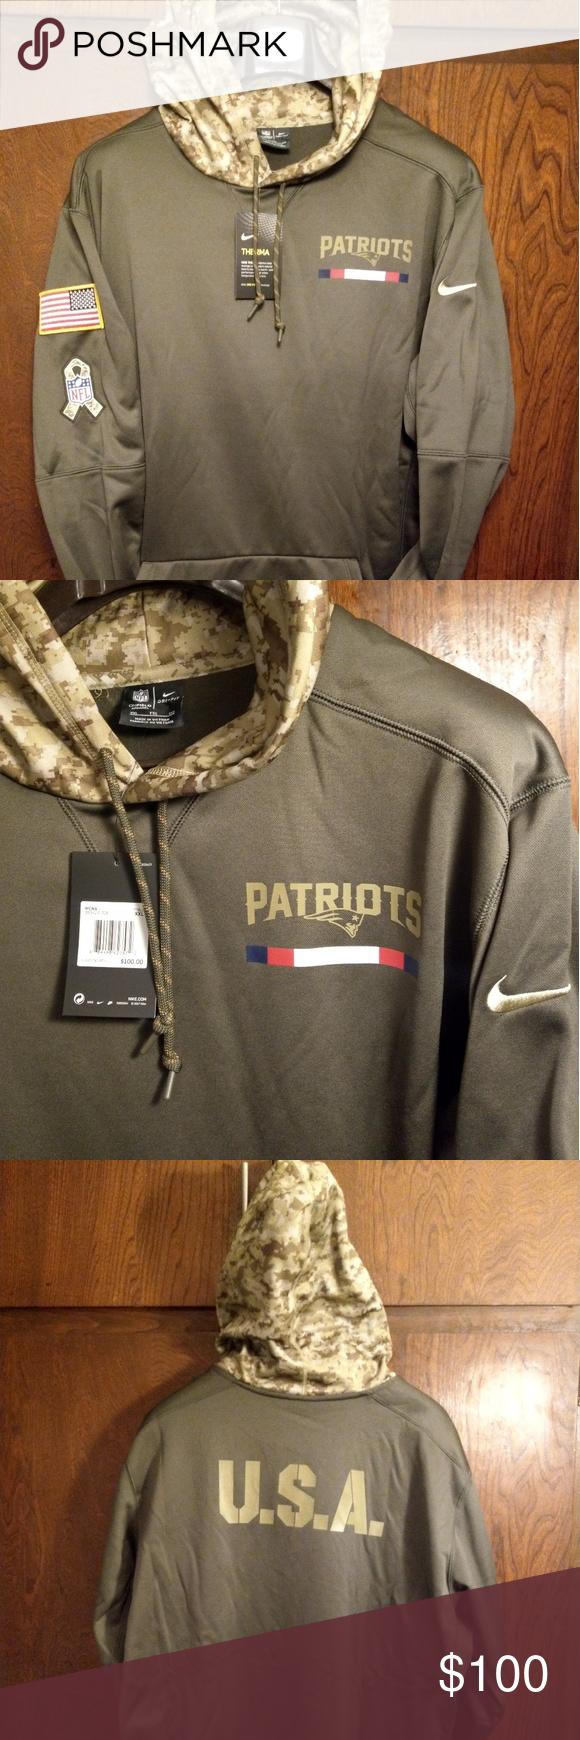 Nike New England Patriots 2017 Salute to Service Nike New England Patriots  2017 Salute to Service Hoodie 853423 325 XXL NWT Nike Shirts Sweatshirts    ... 06f00c15c